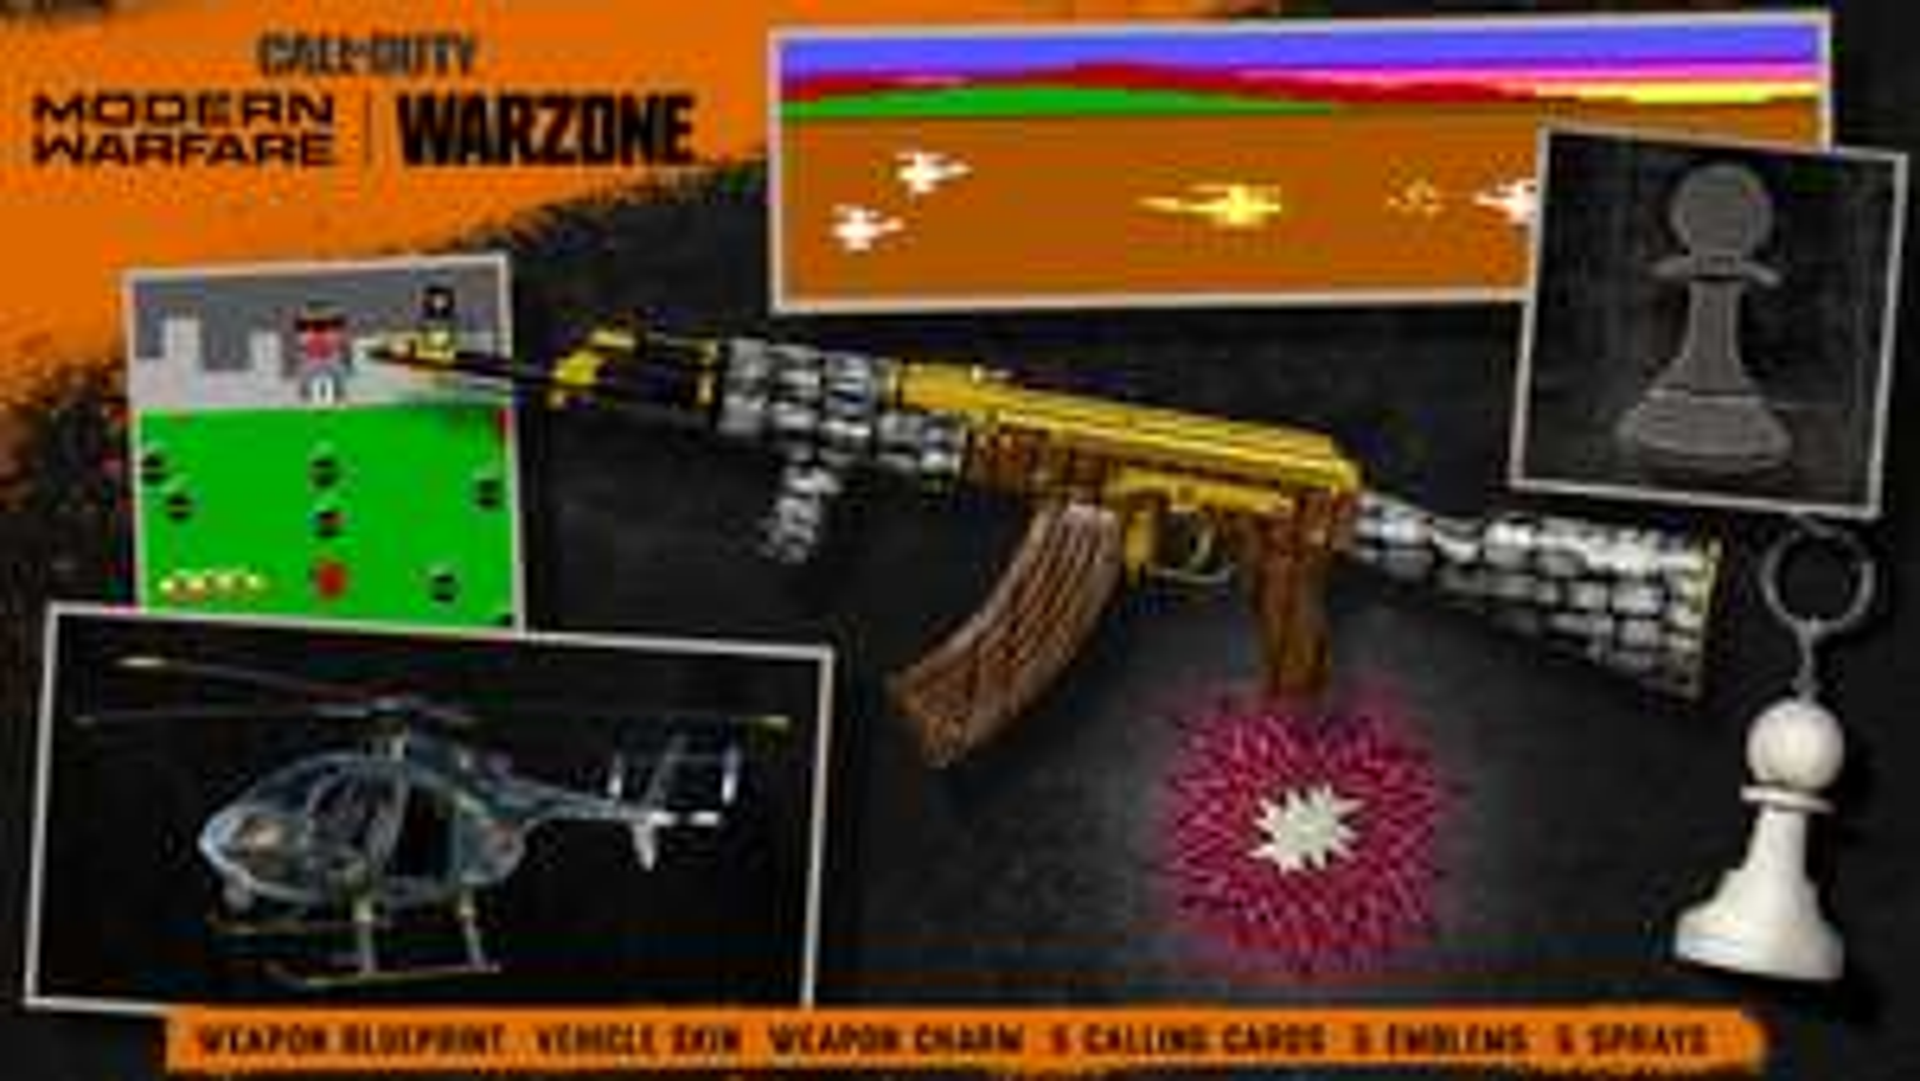 Call of Duty Warzone / Cold War / Mobile / Gratis AK Skin / Helikopter Skin / 5 Visitenkarten / Embleme / 5 Sprays / Anhänger